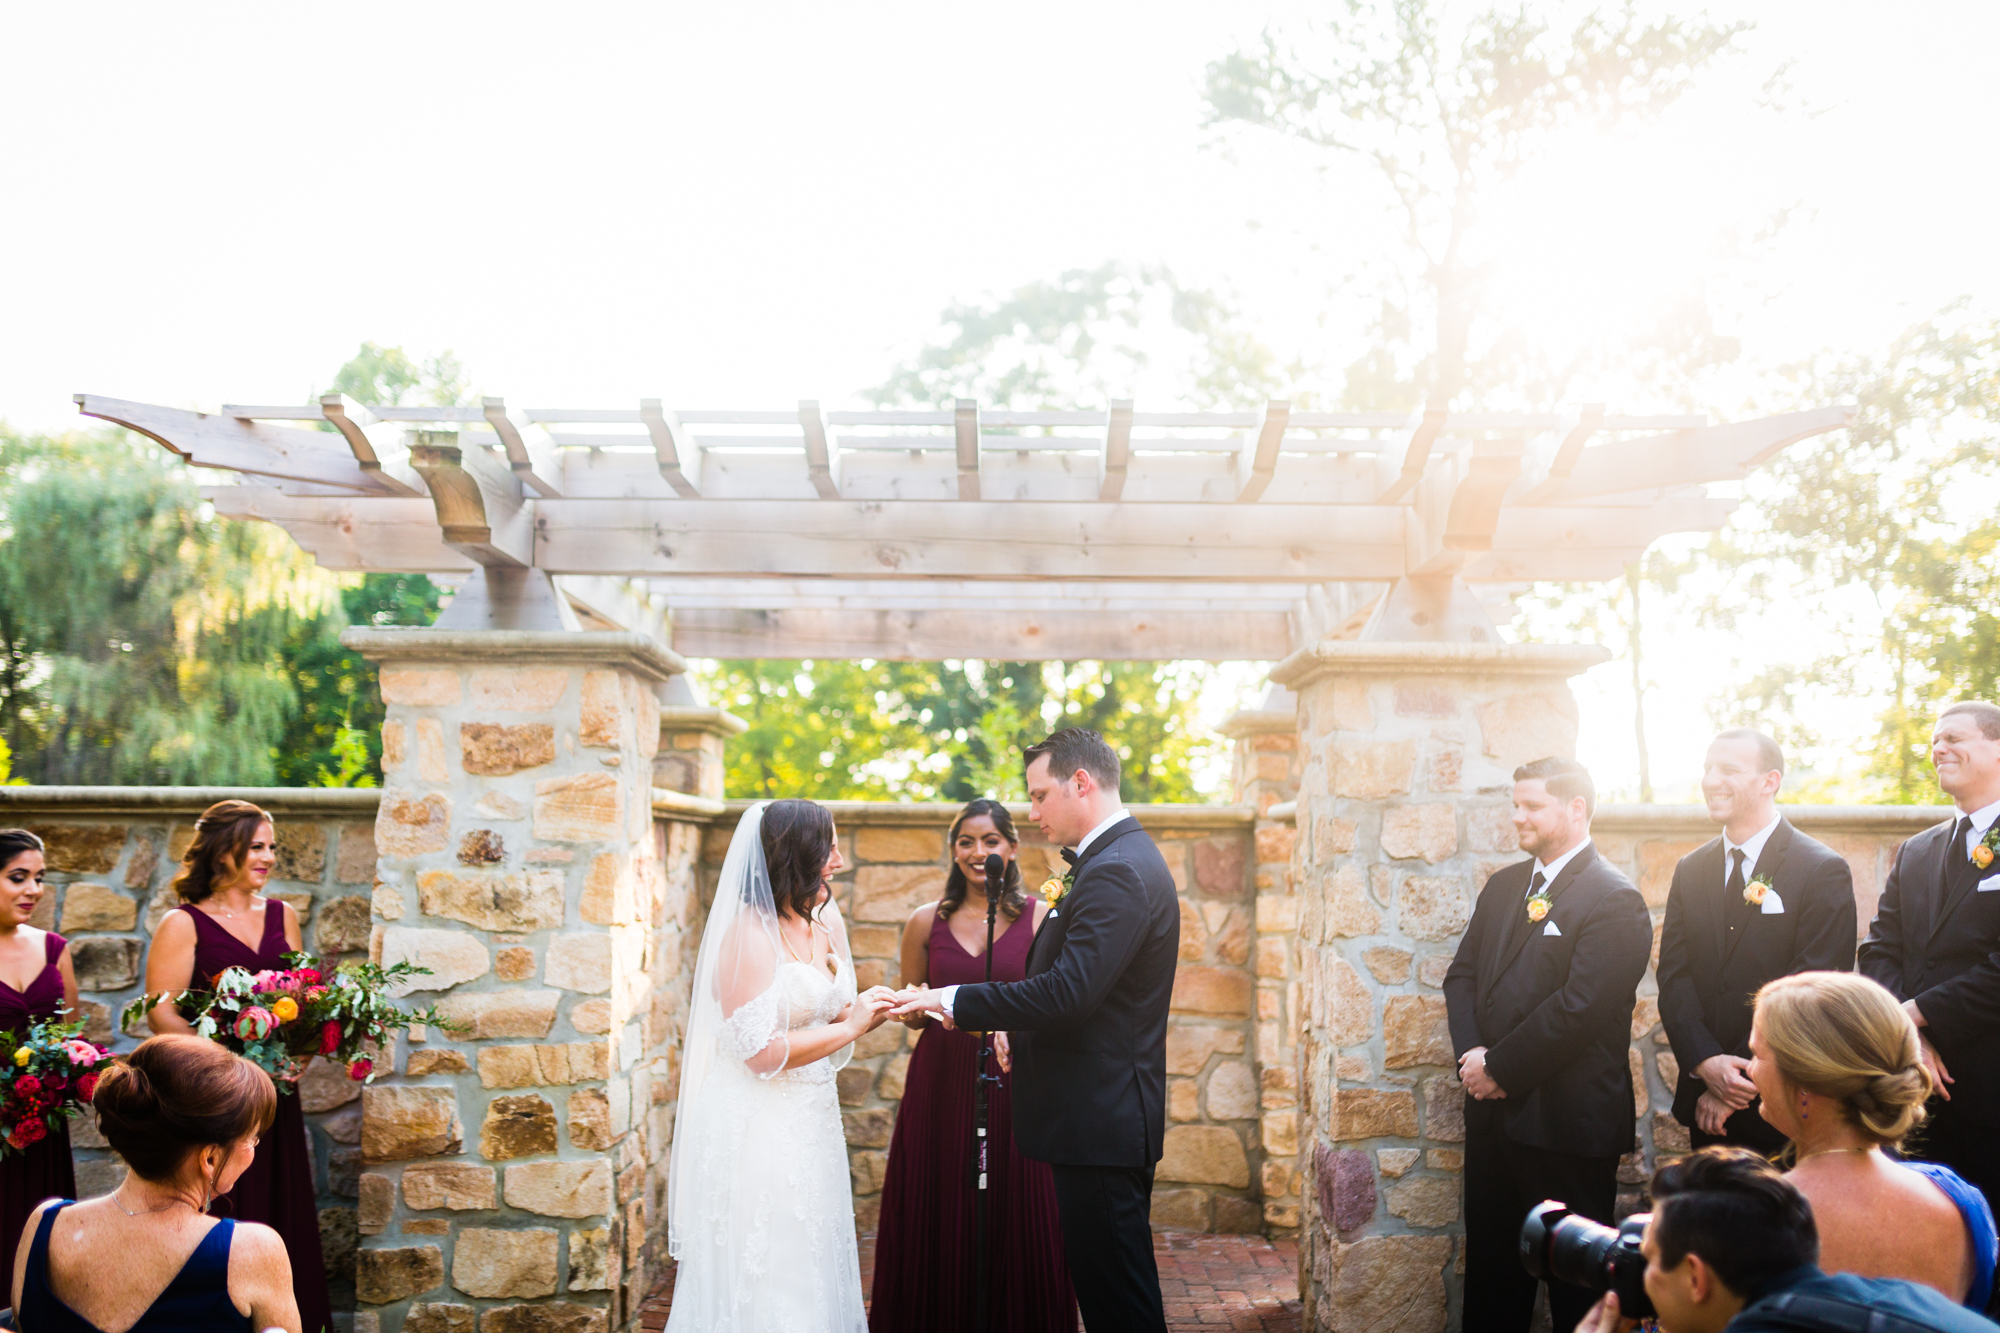 Hotel Du Village - LoveStruck Pictures - Wedding Photography-070.jpg